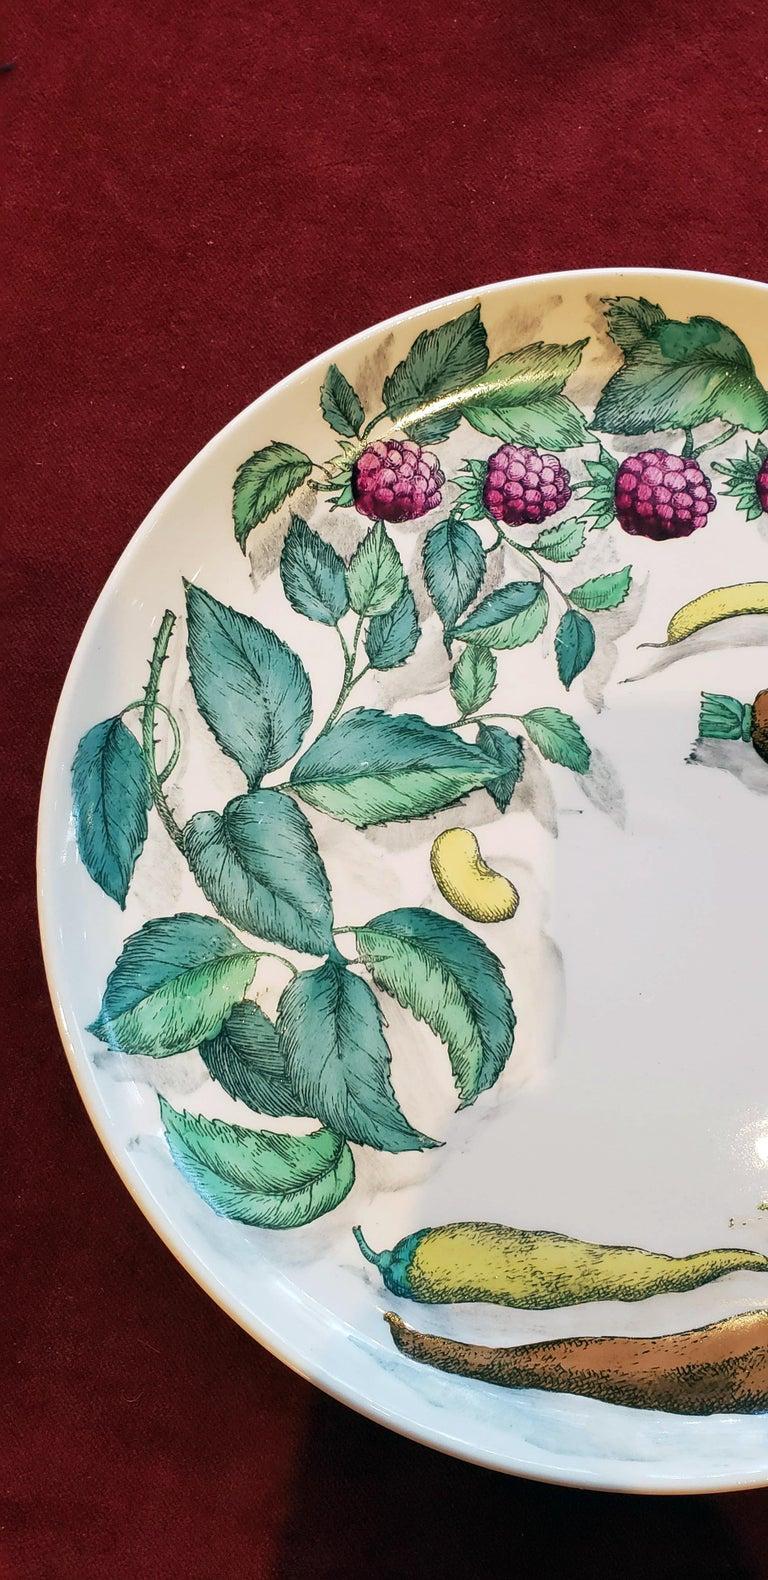 Italian Piero Fornasetti Pottery Vegetalia Plate, #10 Morino, 1955 For Sale